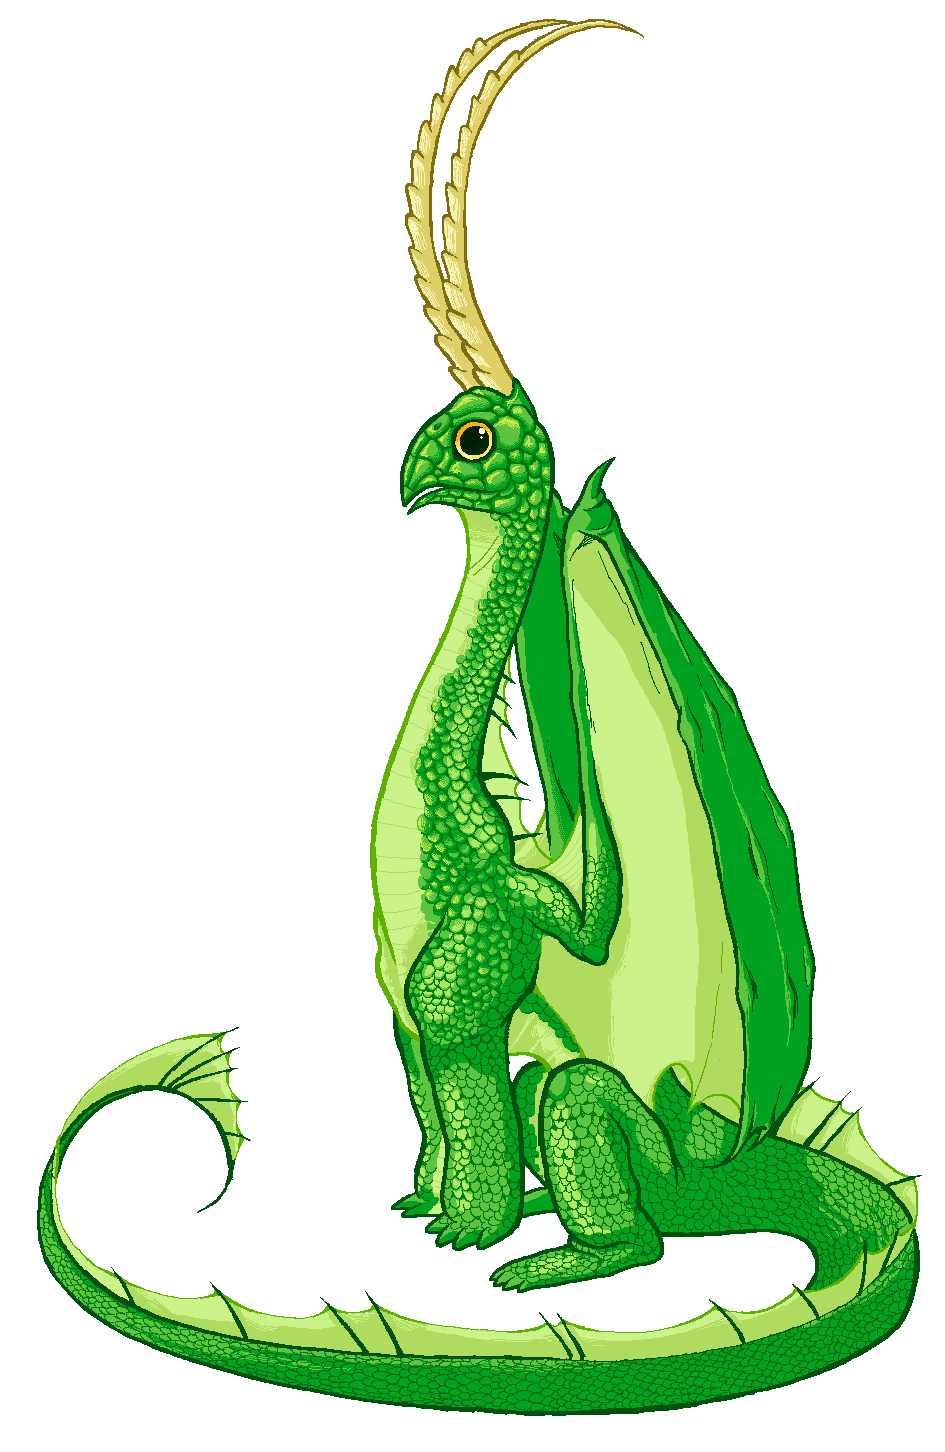 "dungeonsanddrawings ""Green Dragon"" - by Blanca Martinez de Rituerto dungeonsanddrawings.blogspot.com (2011-08) © dell'autore tutti i diritti riservati"